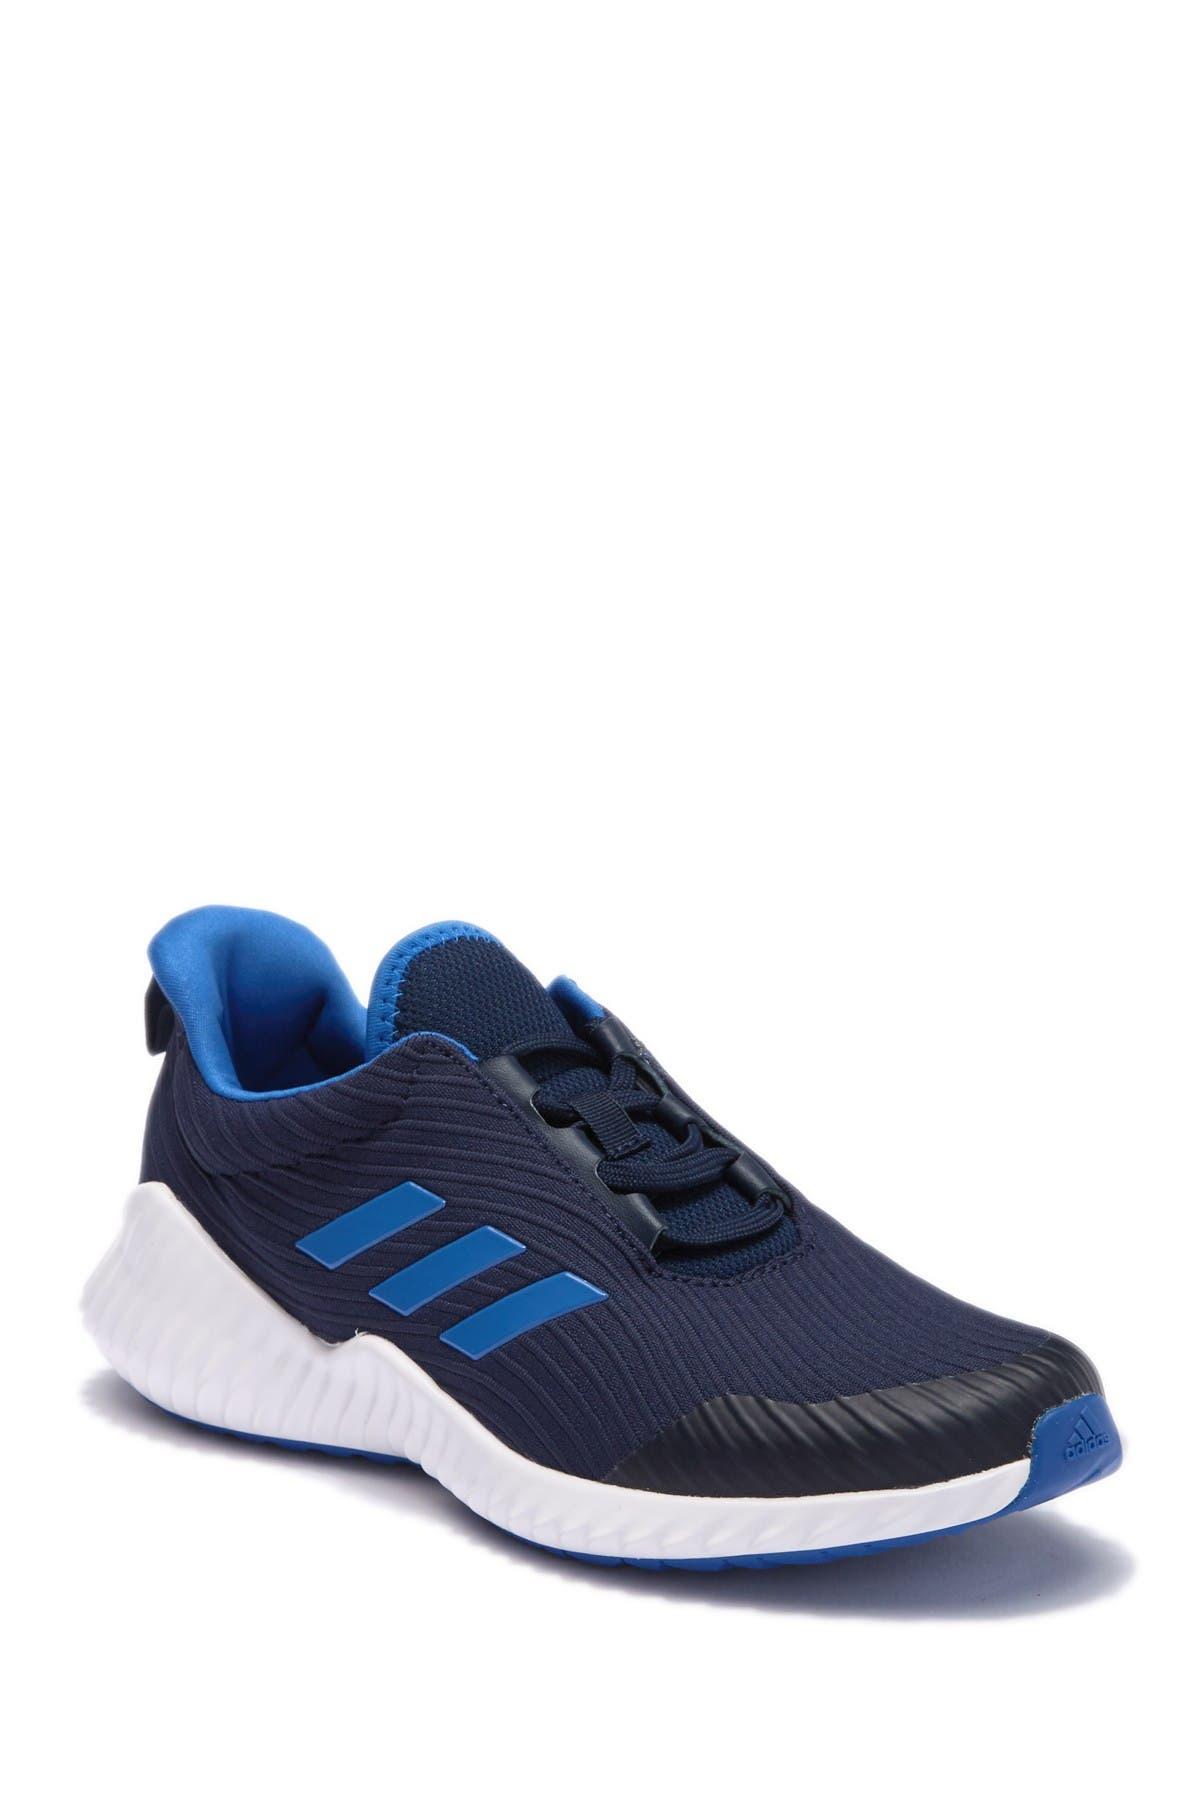 adidas   FortaRun K Sneaker   Nordstrom